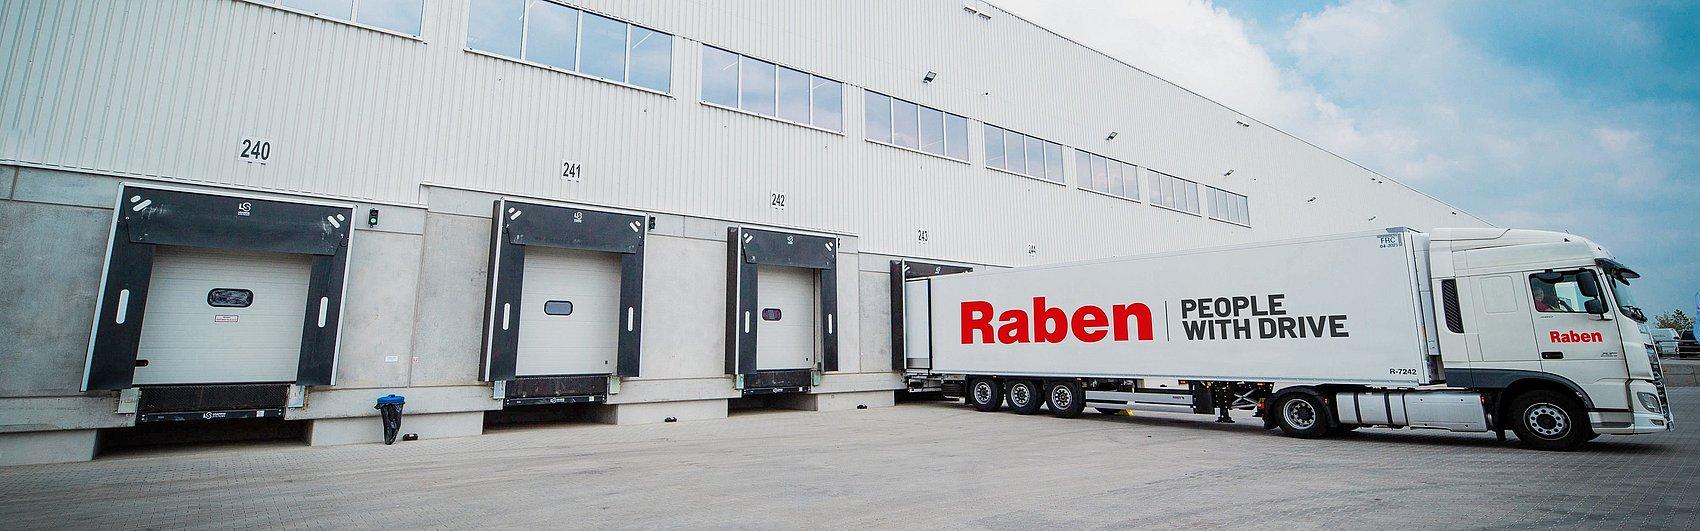 csm_Raben_Truck_PWD_1_69c2d0b130.jpg